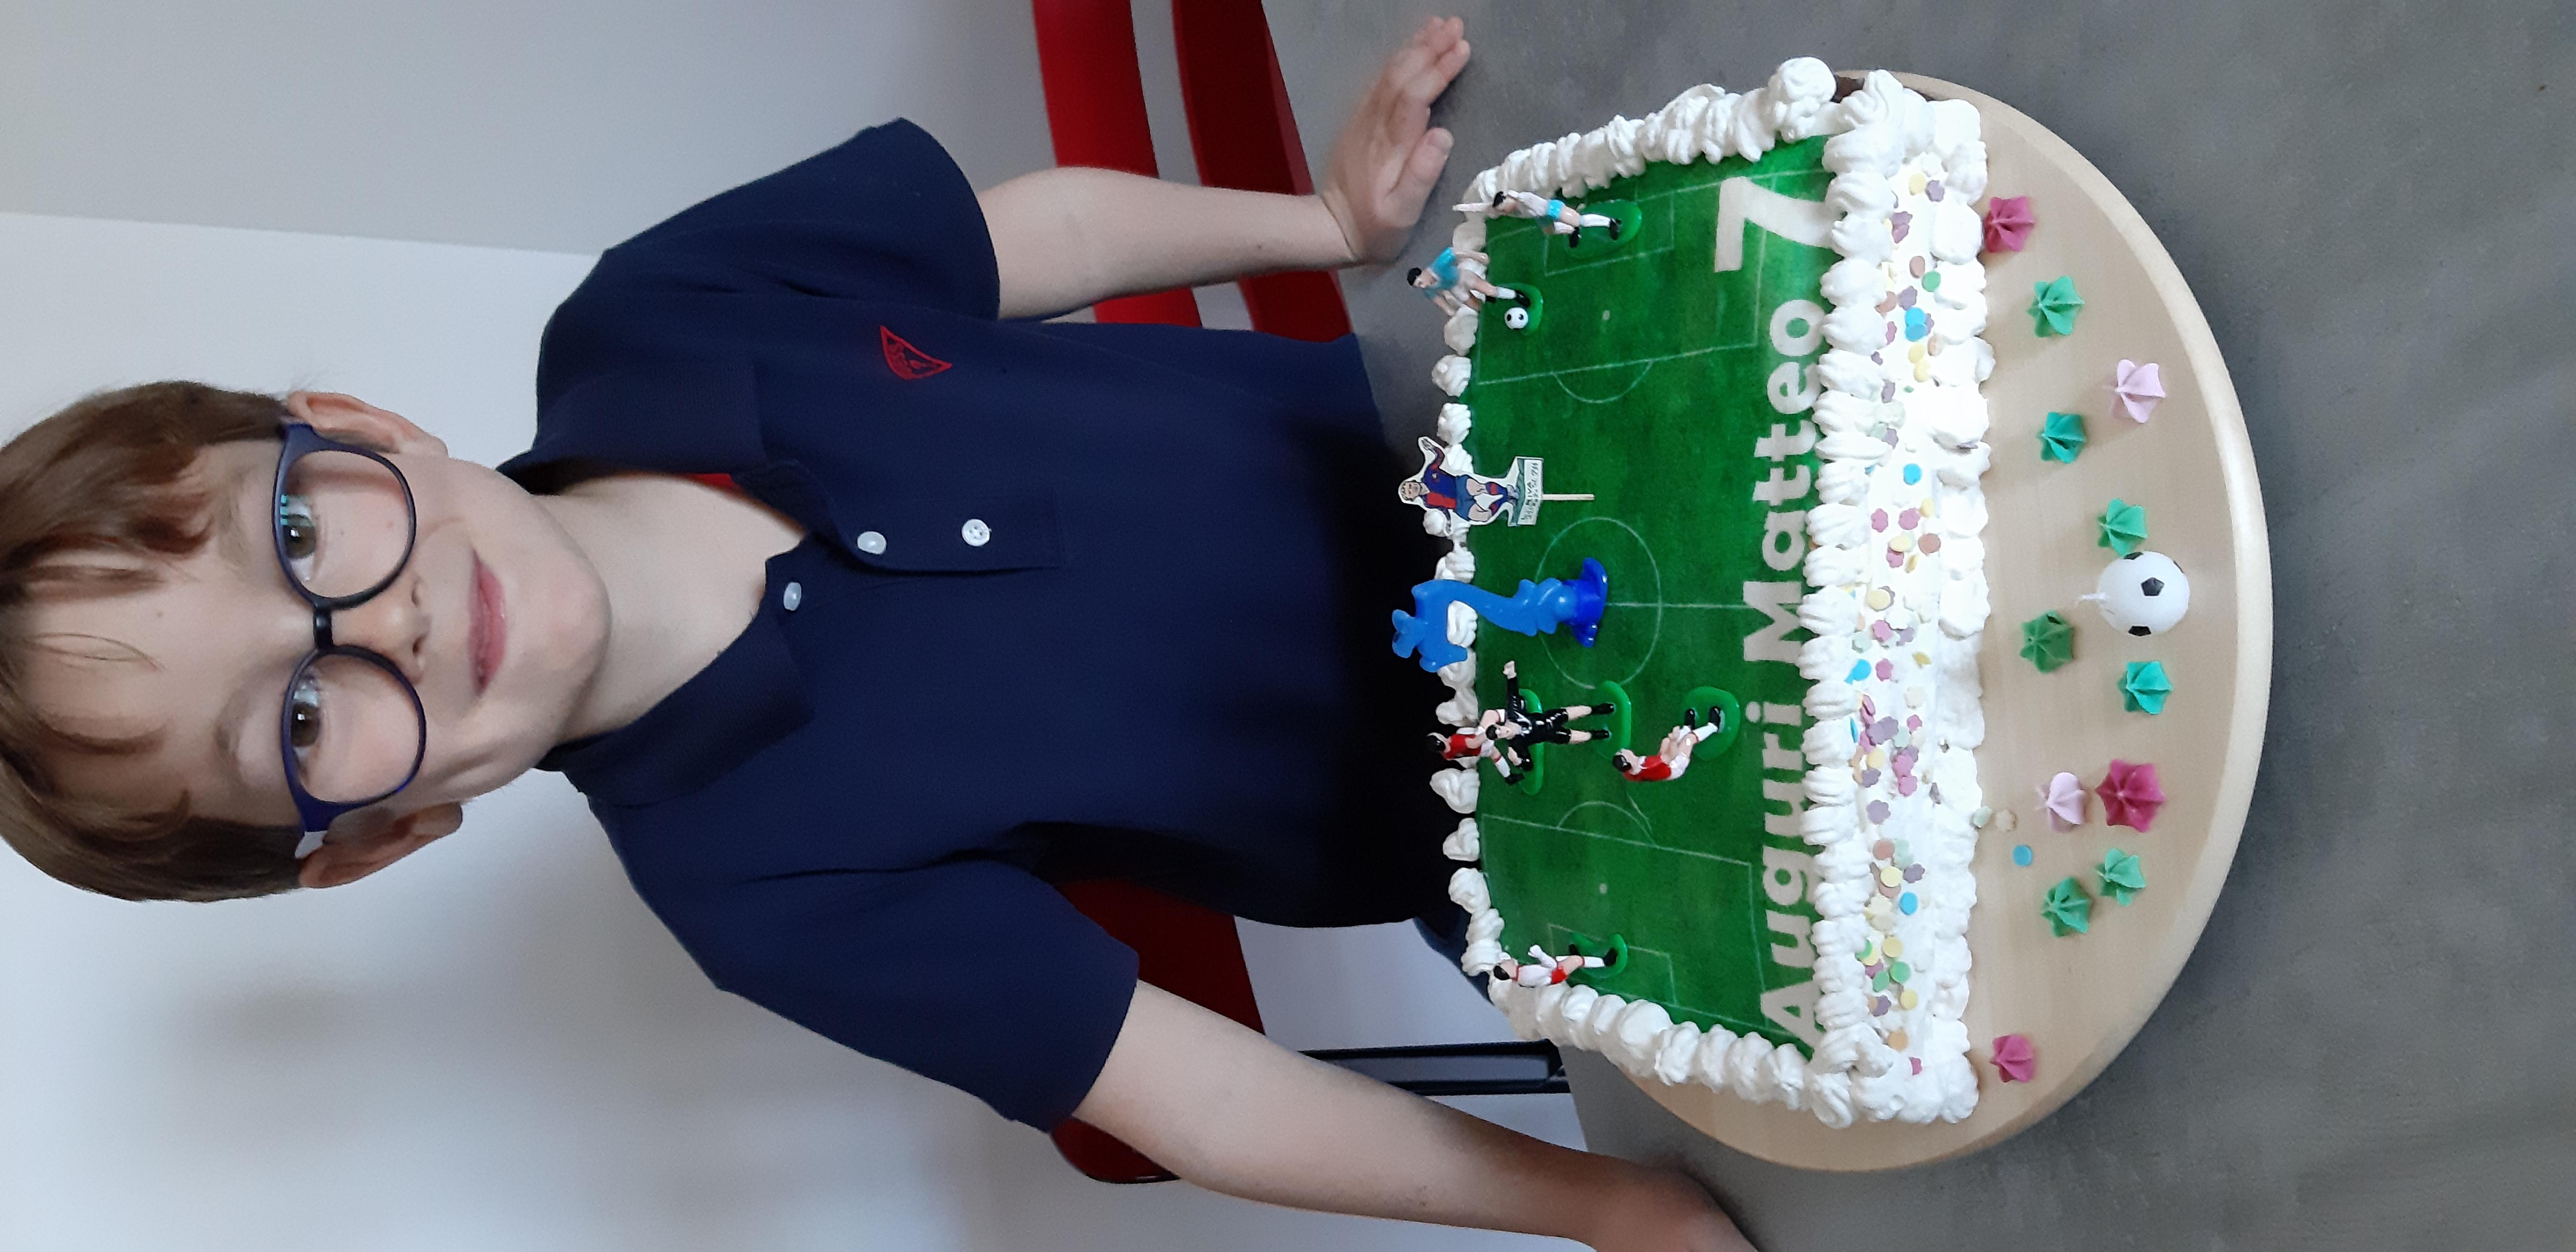 torta di compleanno fatta in casa a tema torta